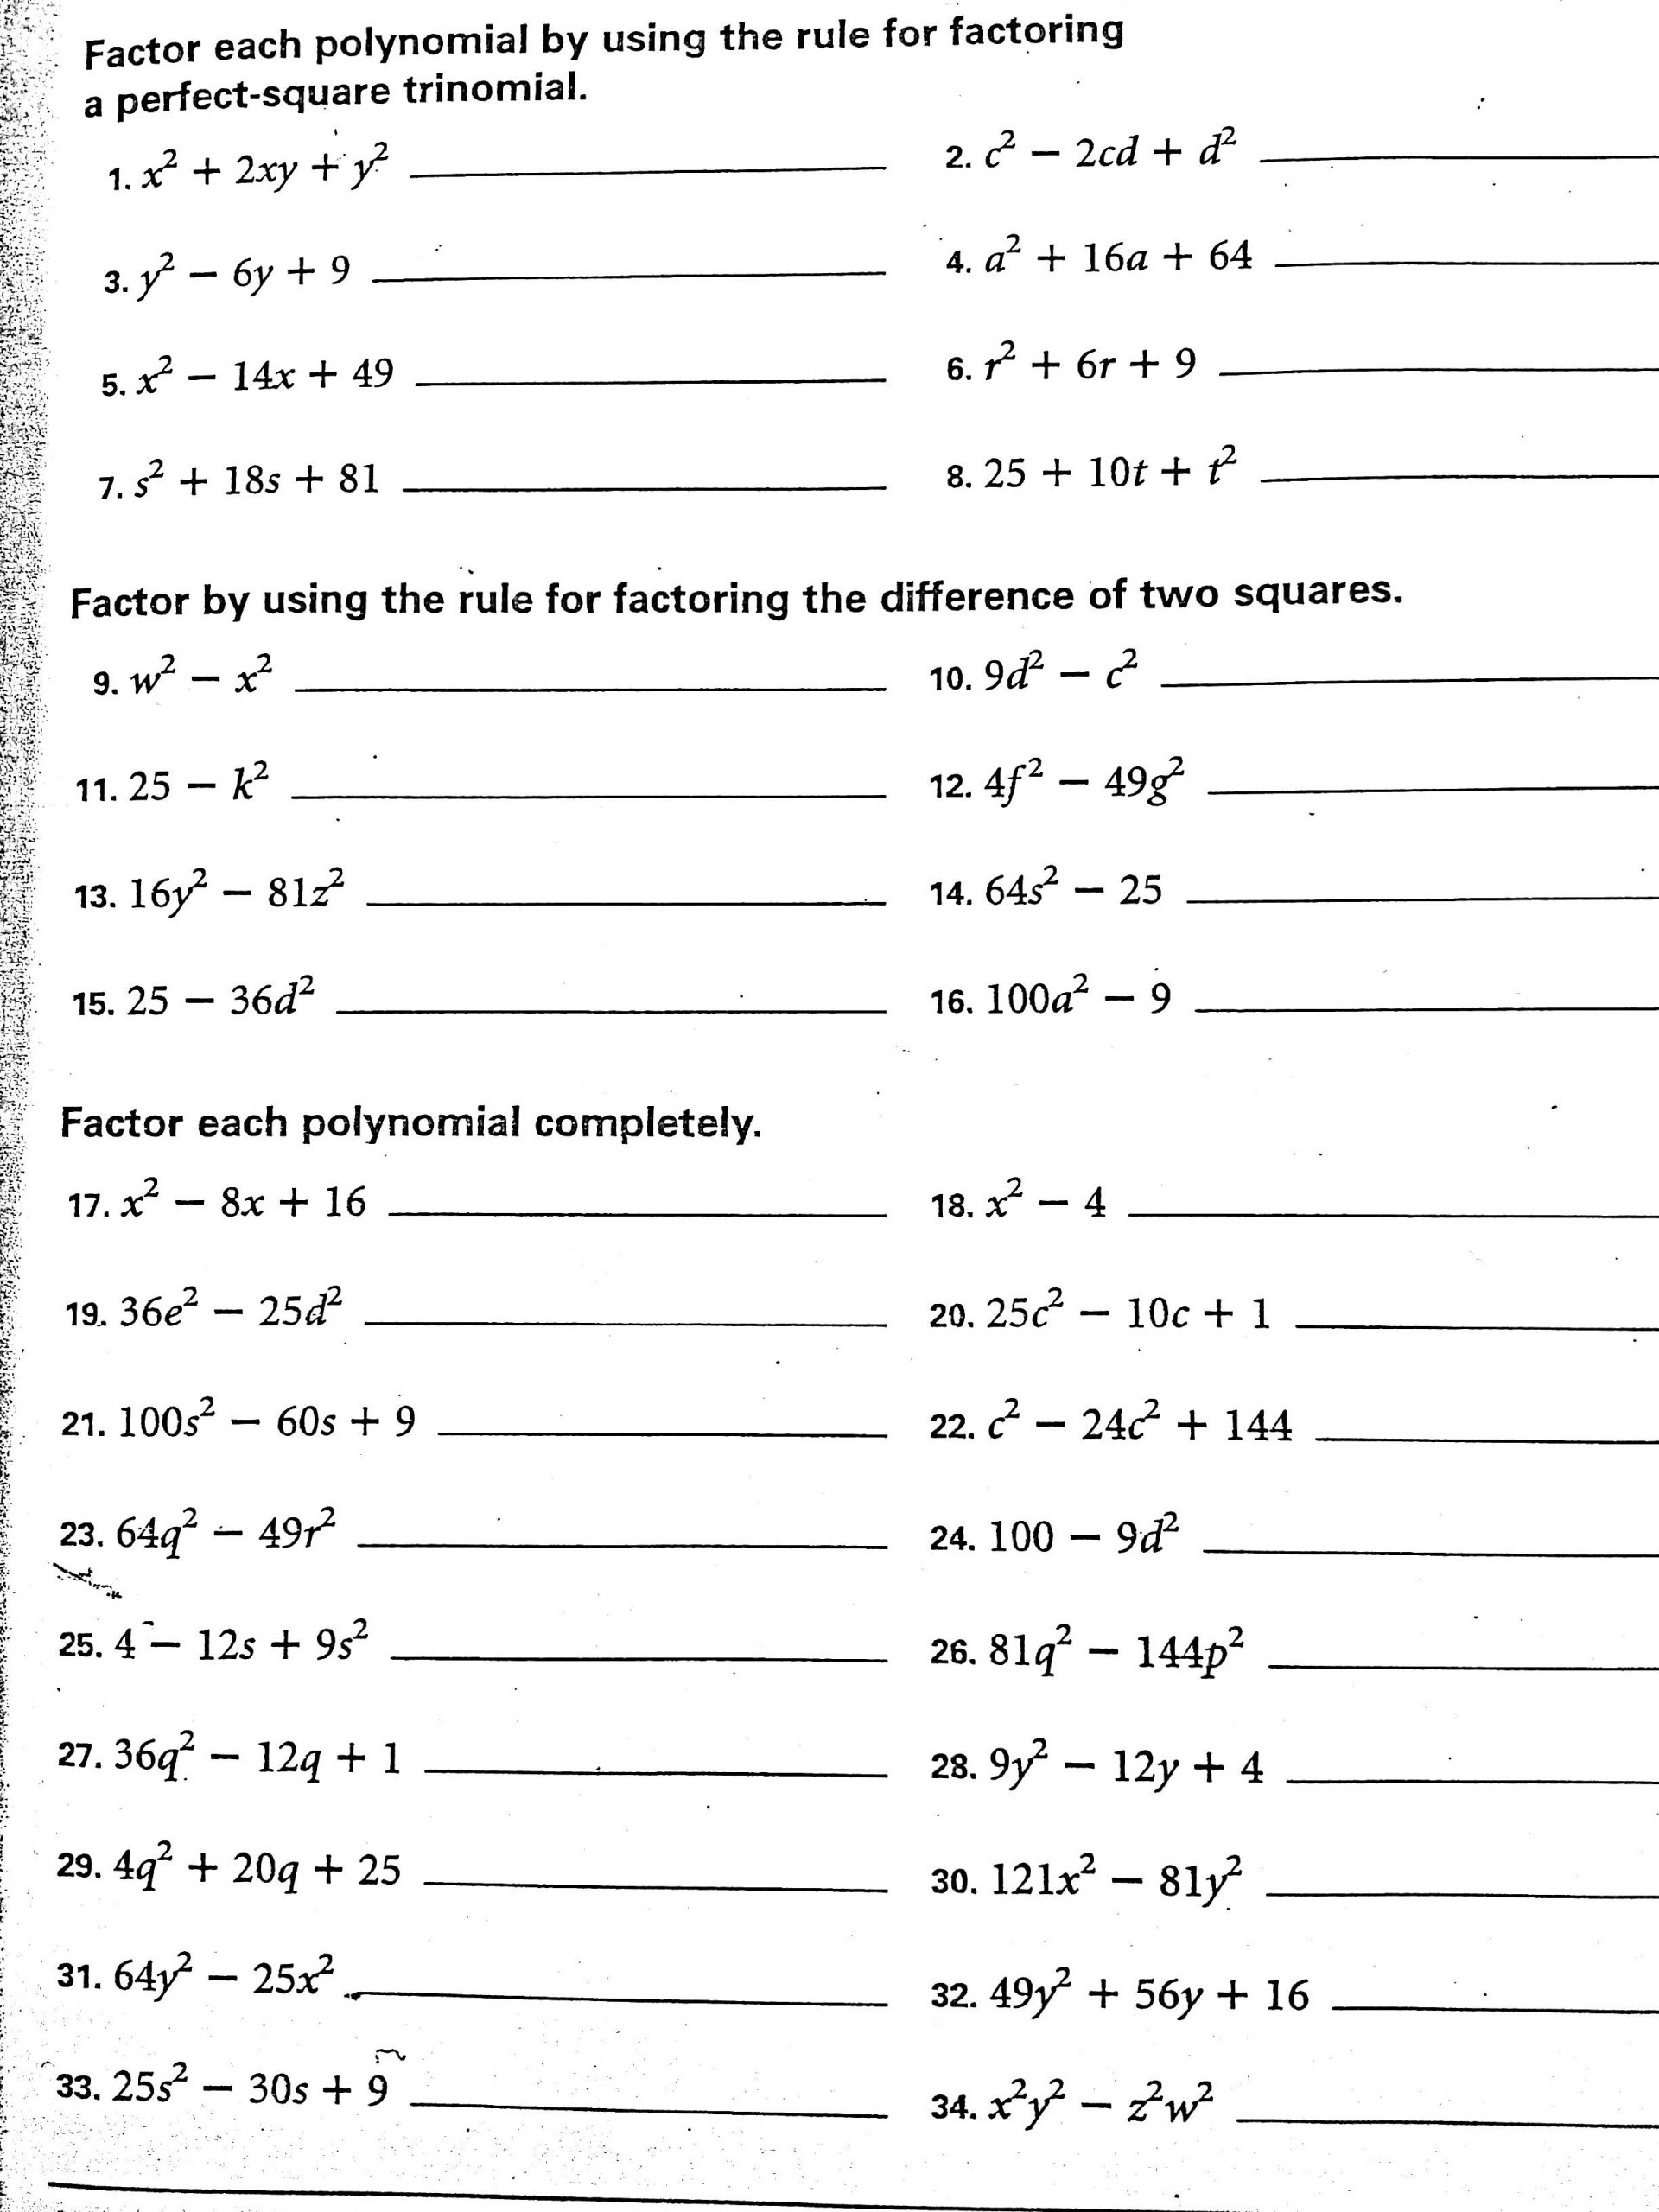 Factoring Trinomials A 1 Worksheet Week Of 10 15 10 19 Swenson Math